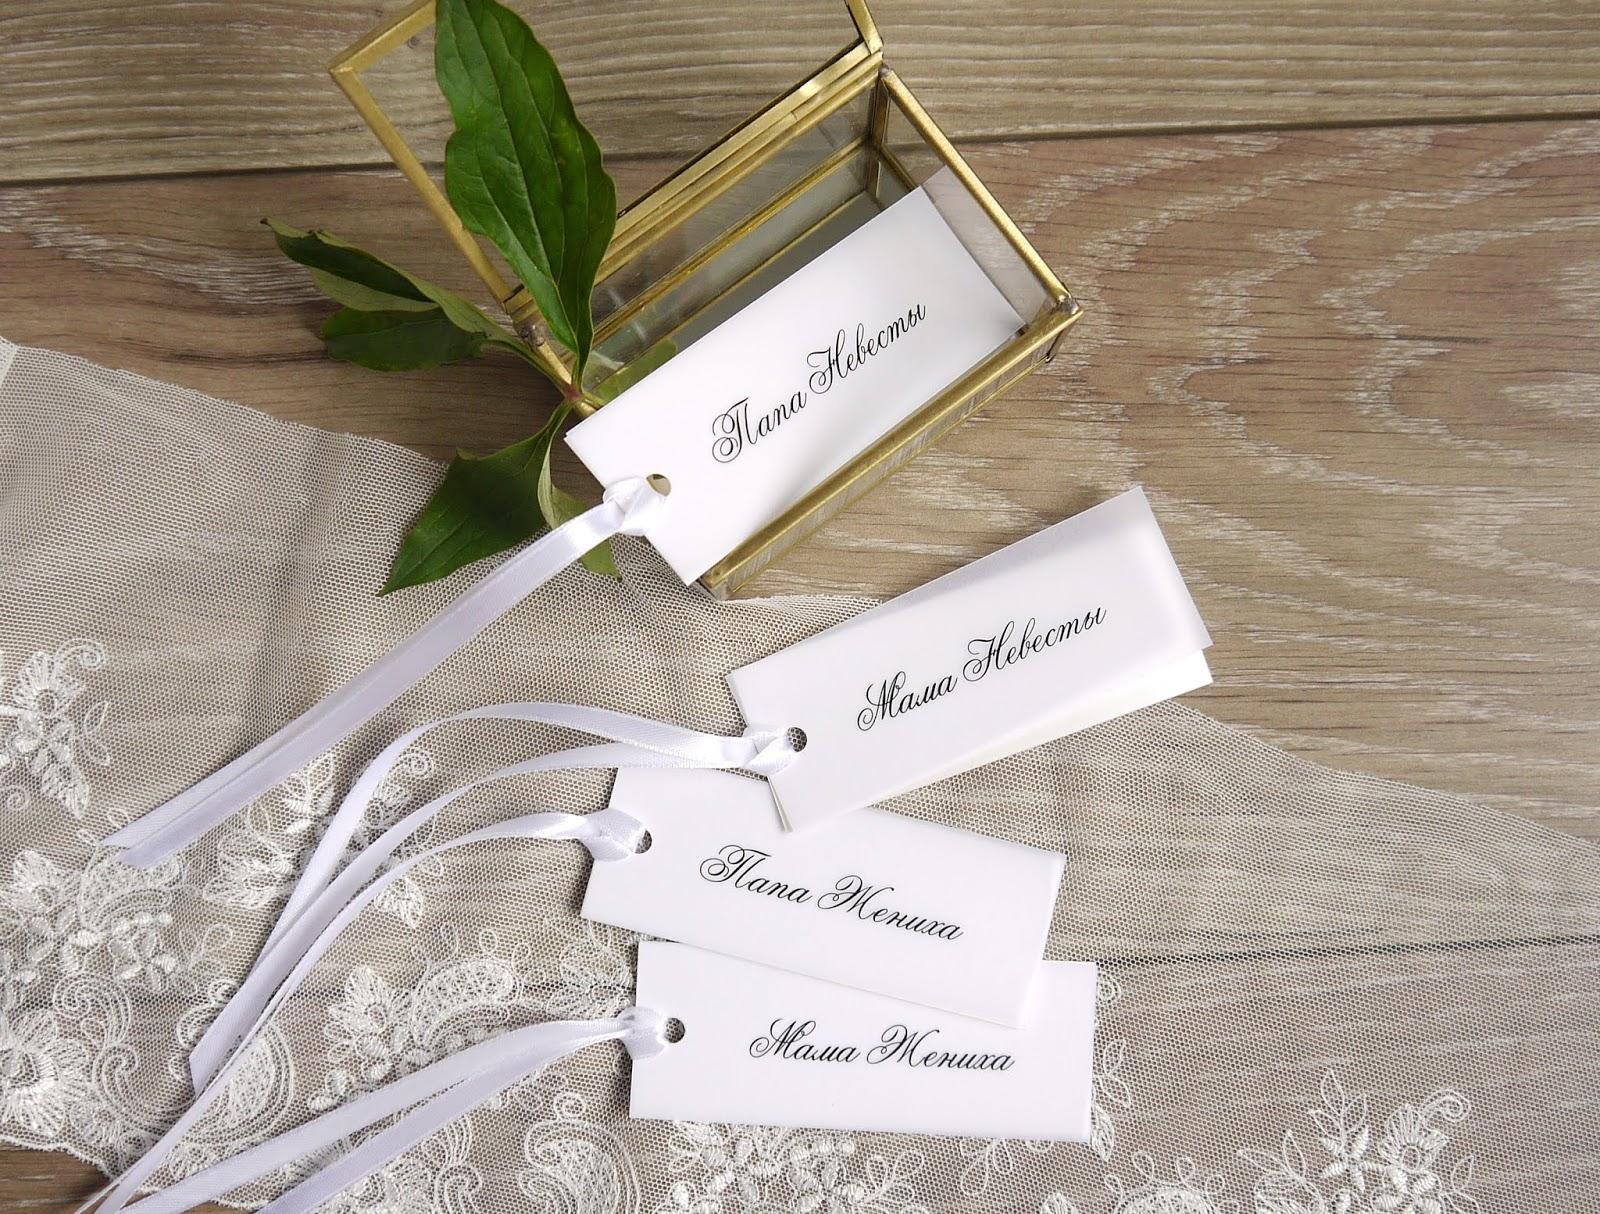 Открытки на стол с именами гостей